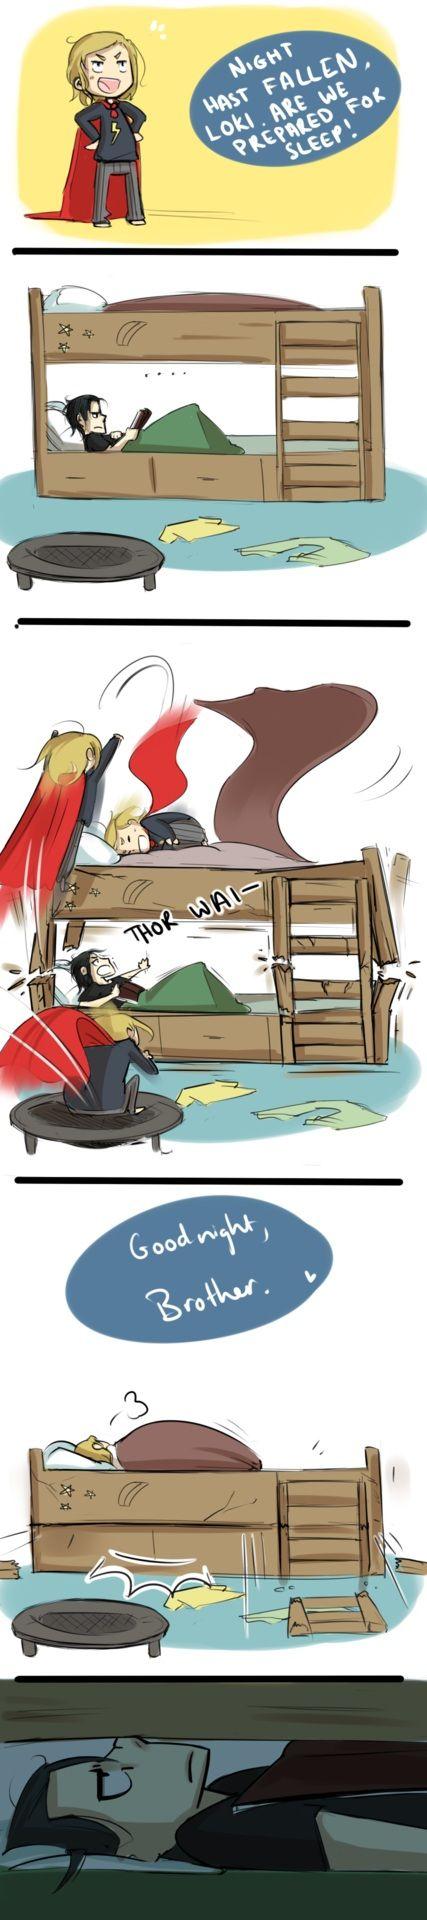 Adorable!  I love their Bro-ventures so much!!!! #Loki #Thor